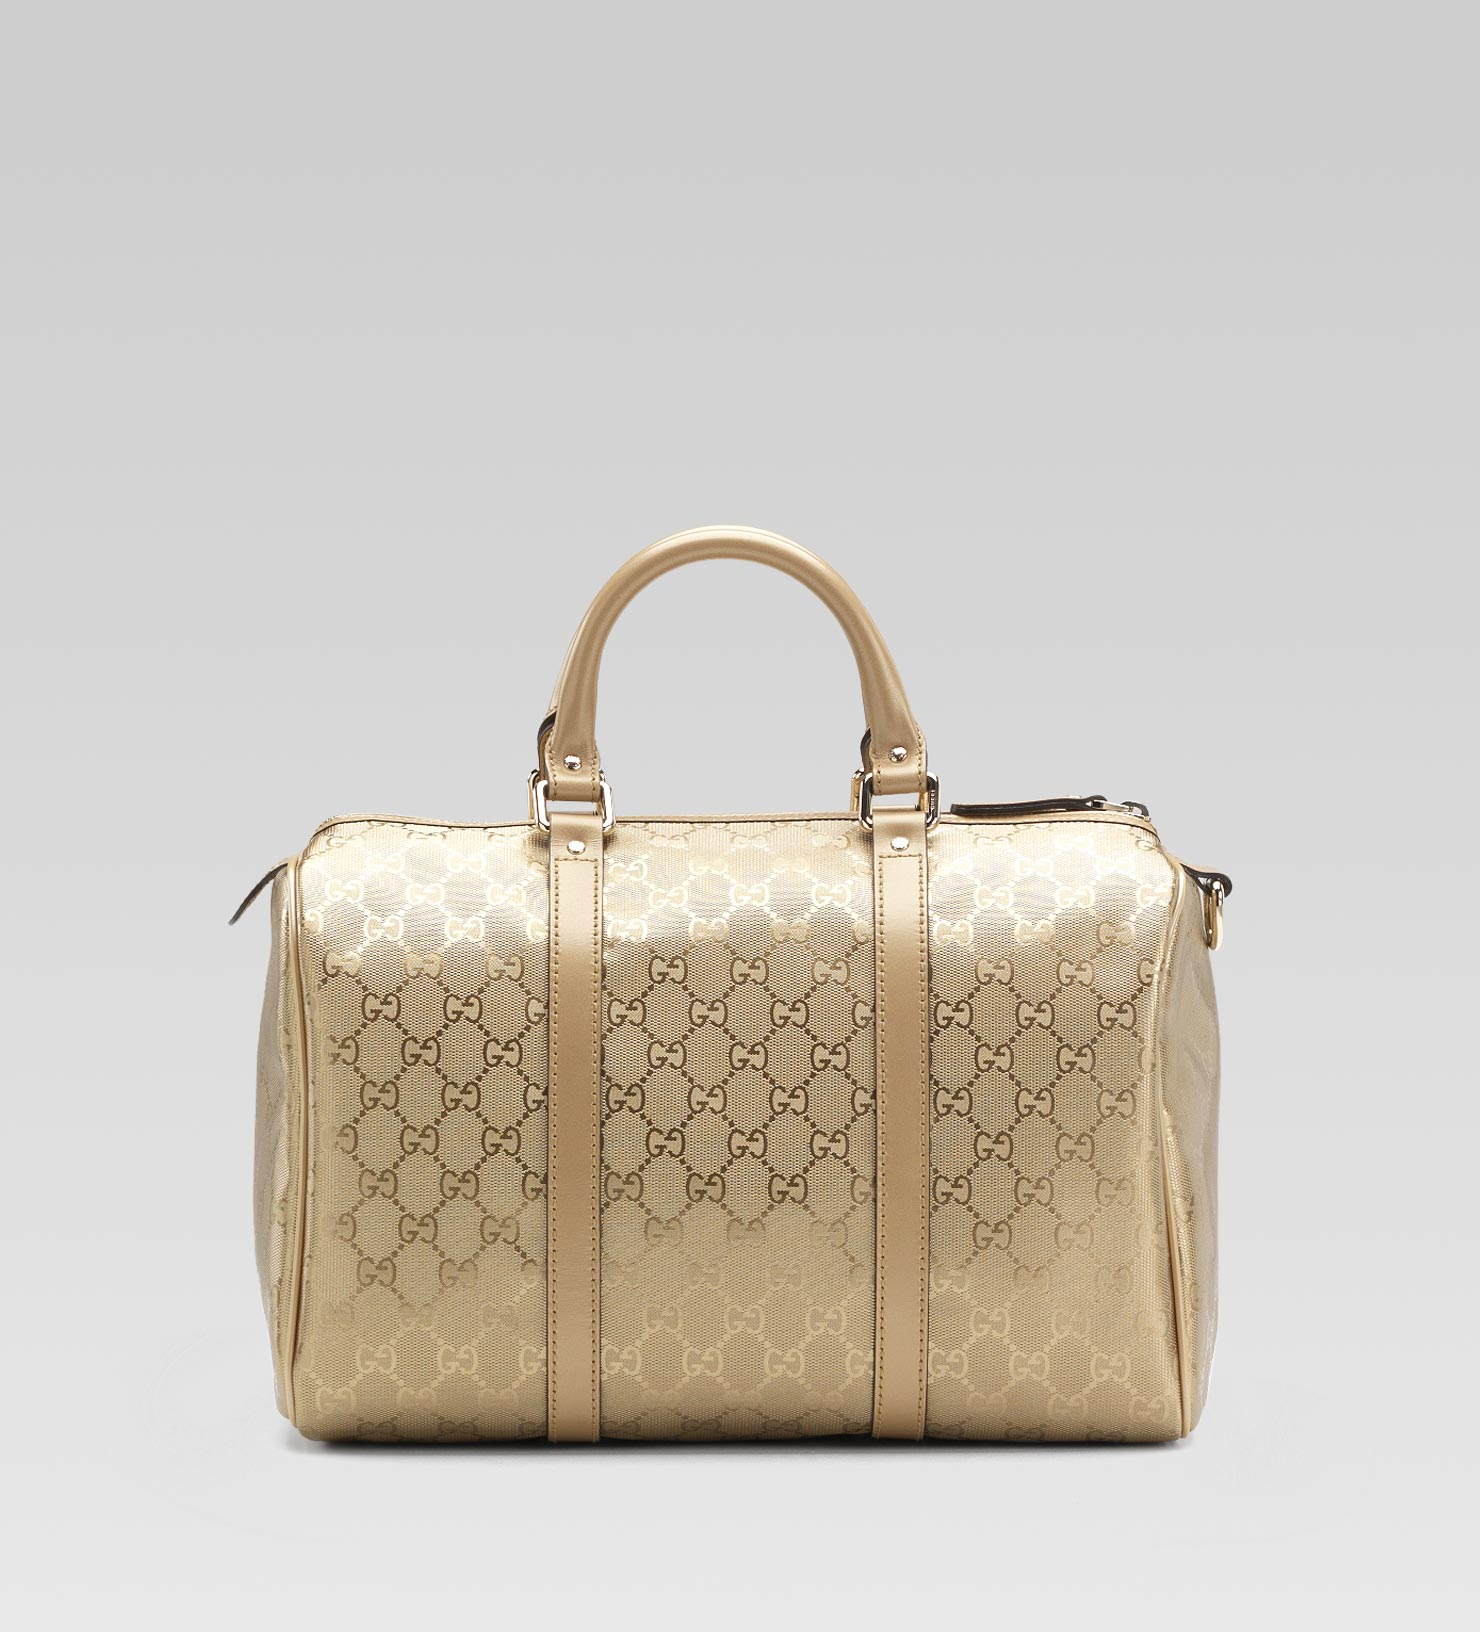 54a5de19512 Lyst - Gucci Joy Boston Bag in Pink